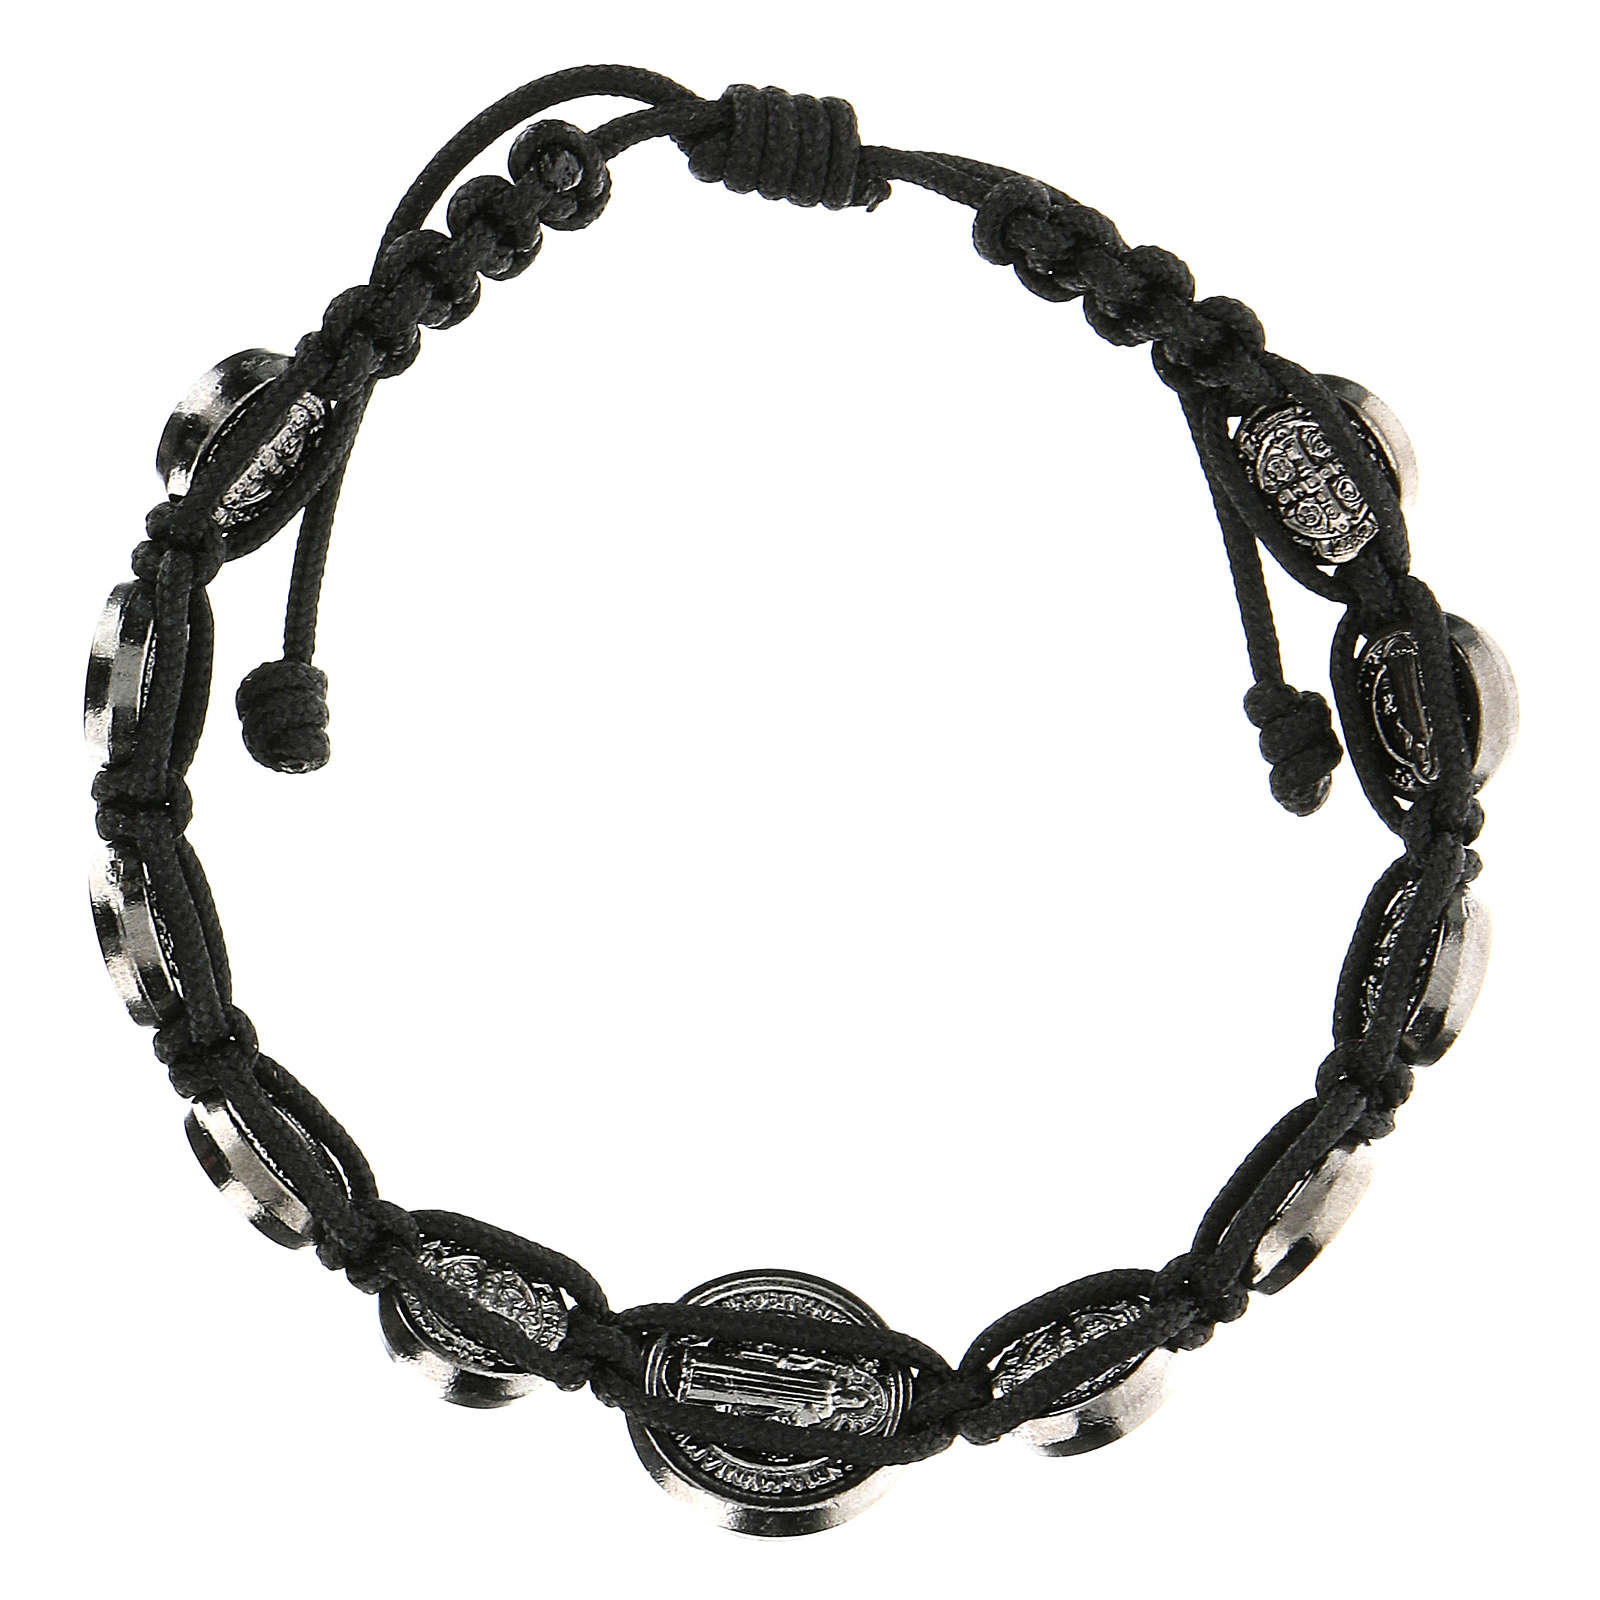 Bracelet corde médailles Saint Benoît Medjugorje 4